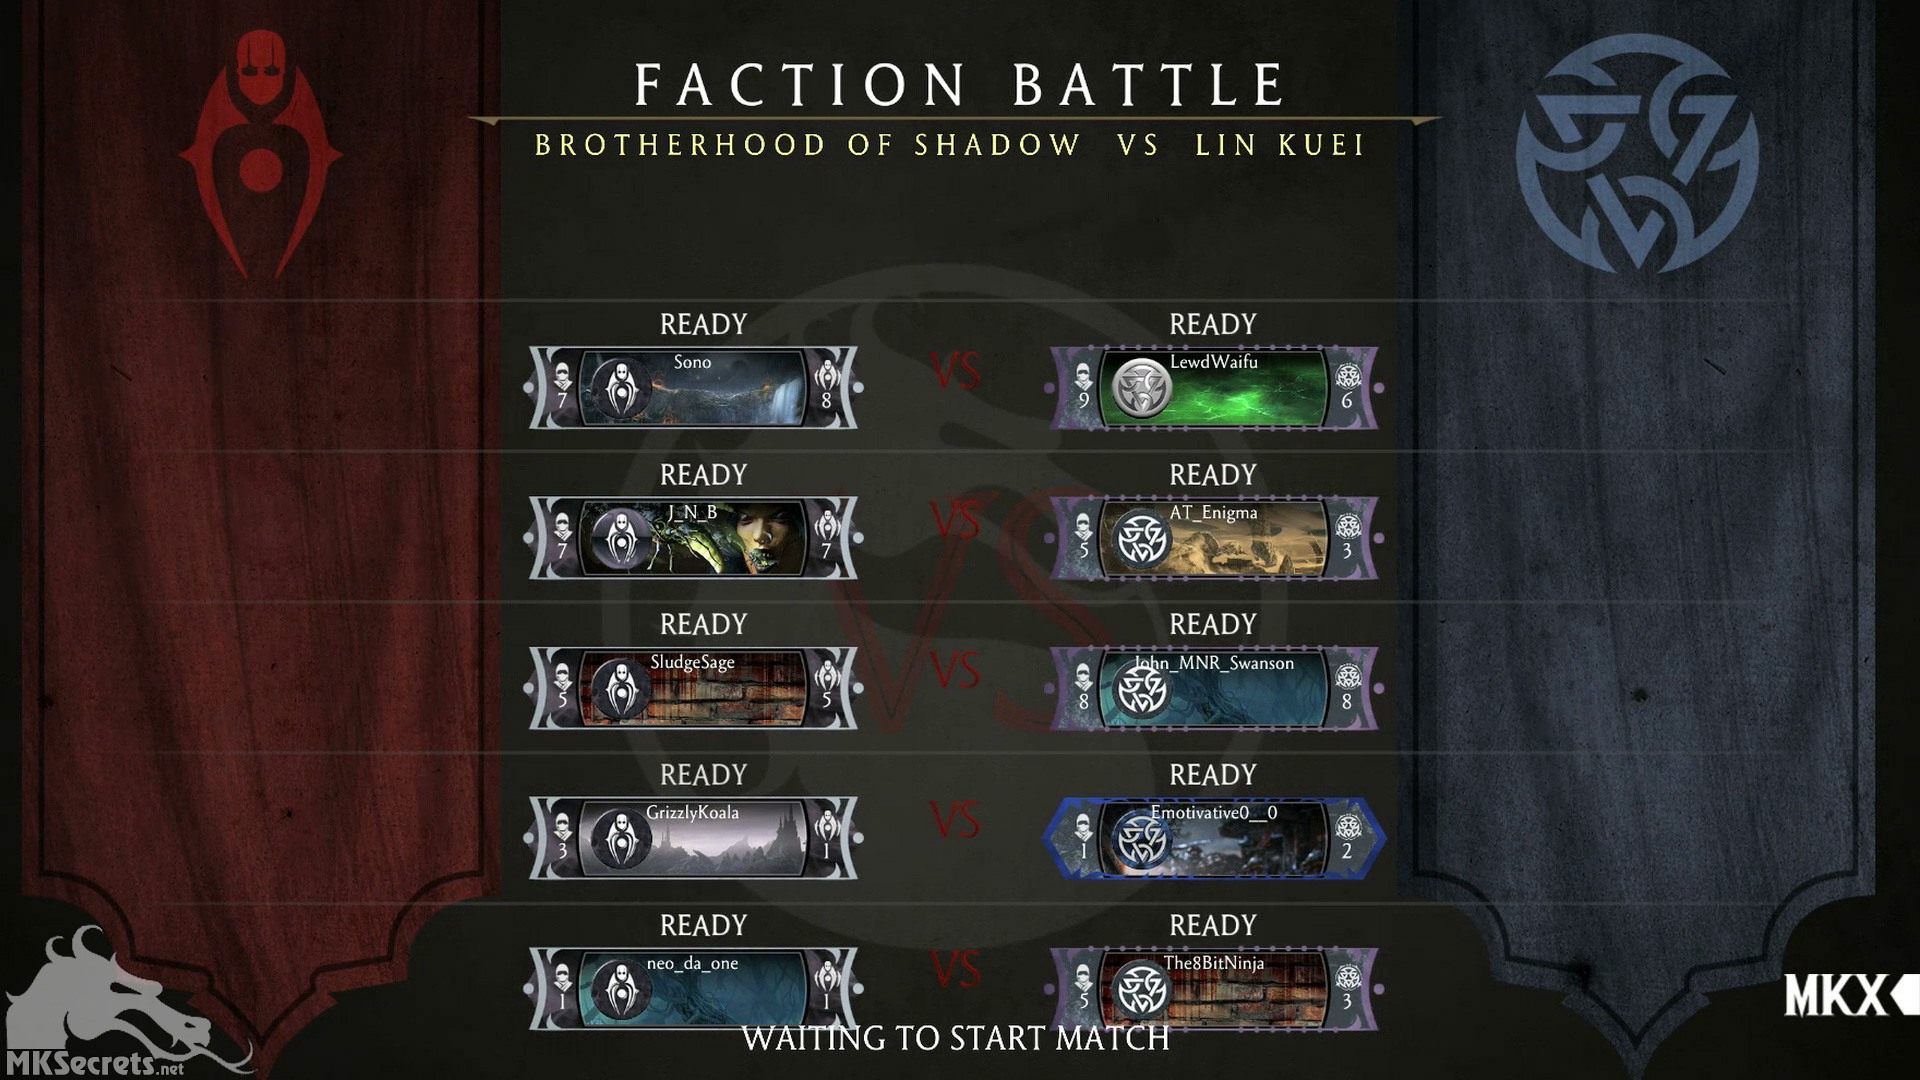 Mortal kombat x faction